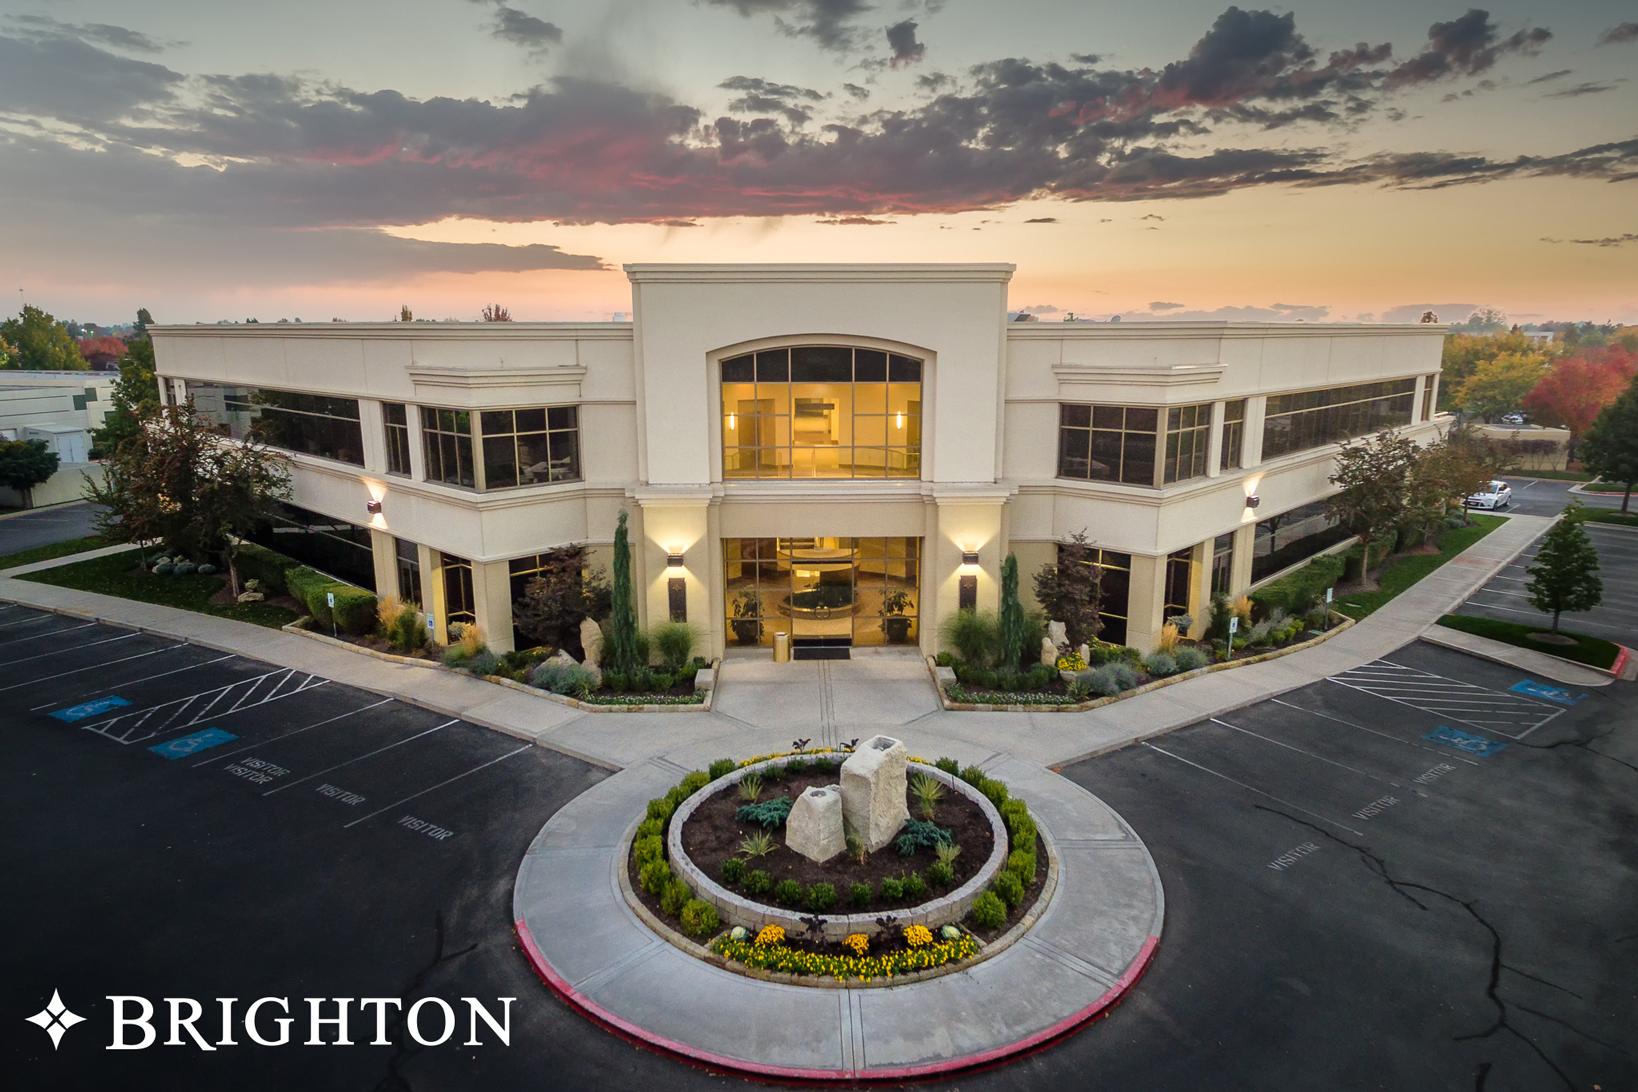 Brighton Corporation Century Farm New Home Meridian Idaho